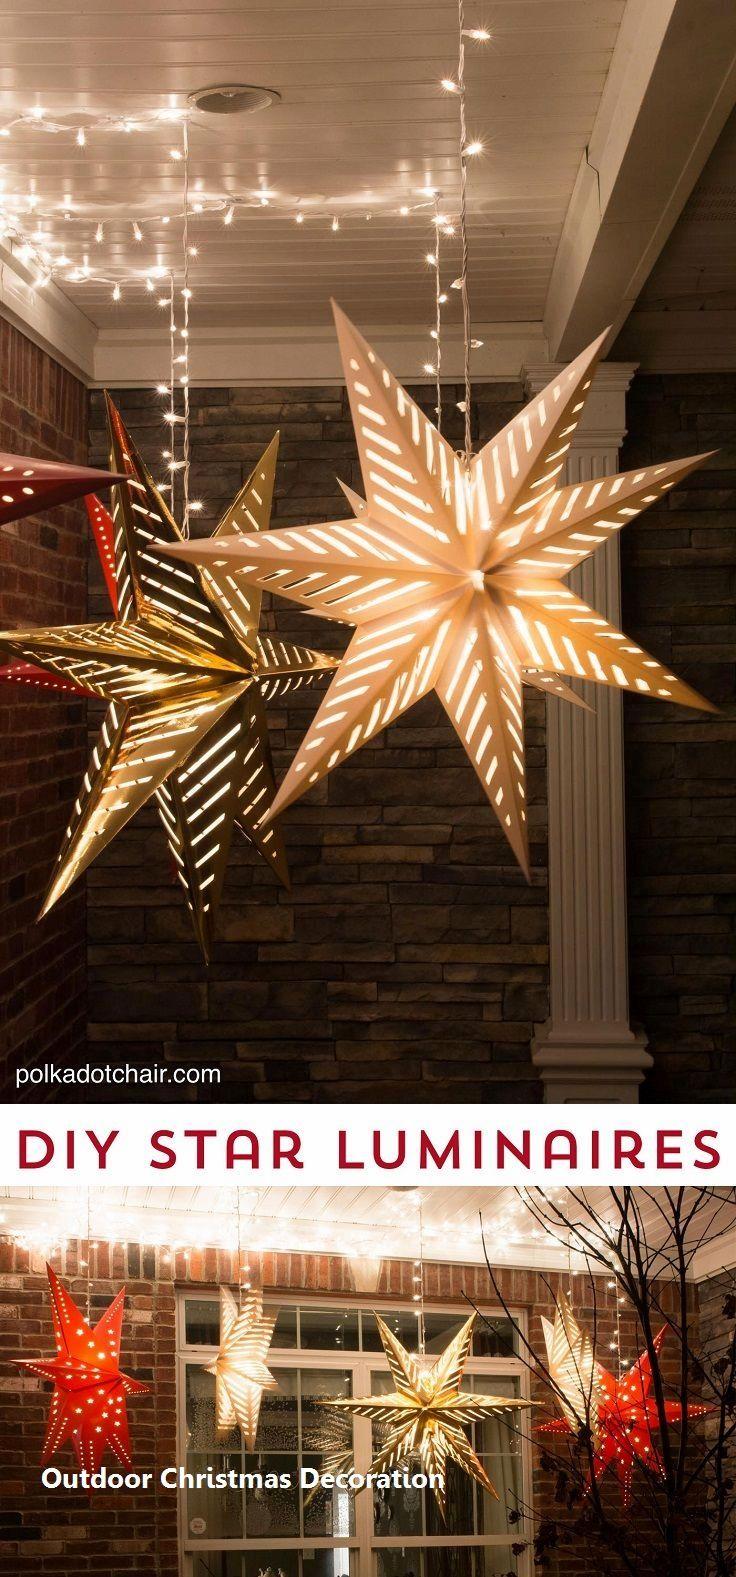 Outdoor Christmas Decoration 2020 Diy Christmas Star Decorating With Christmas Lights Outdoor Christmas